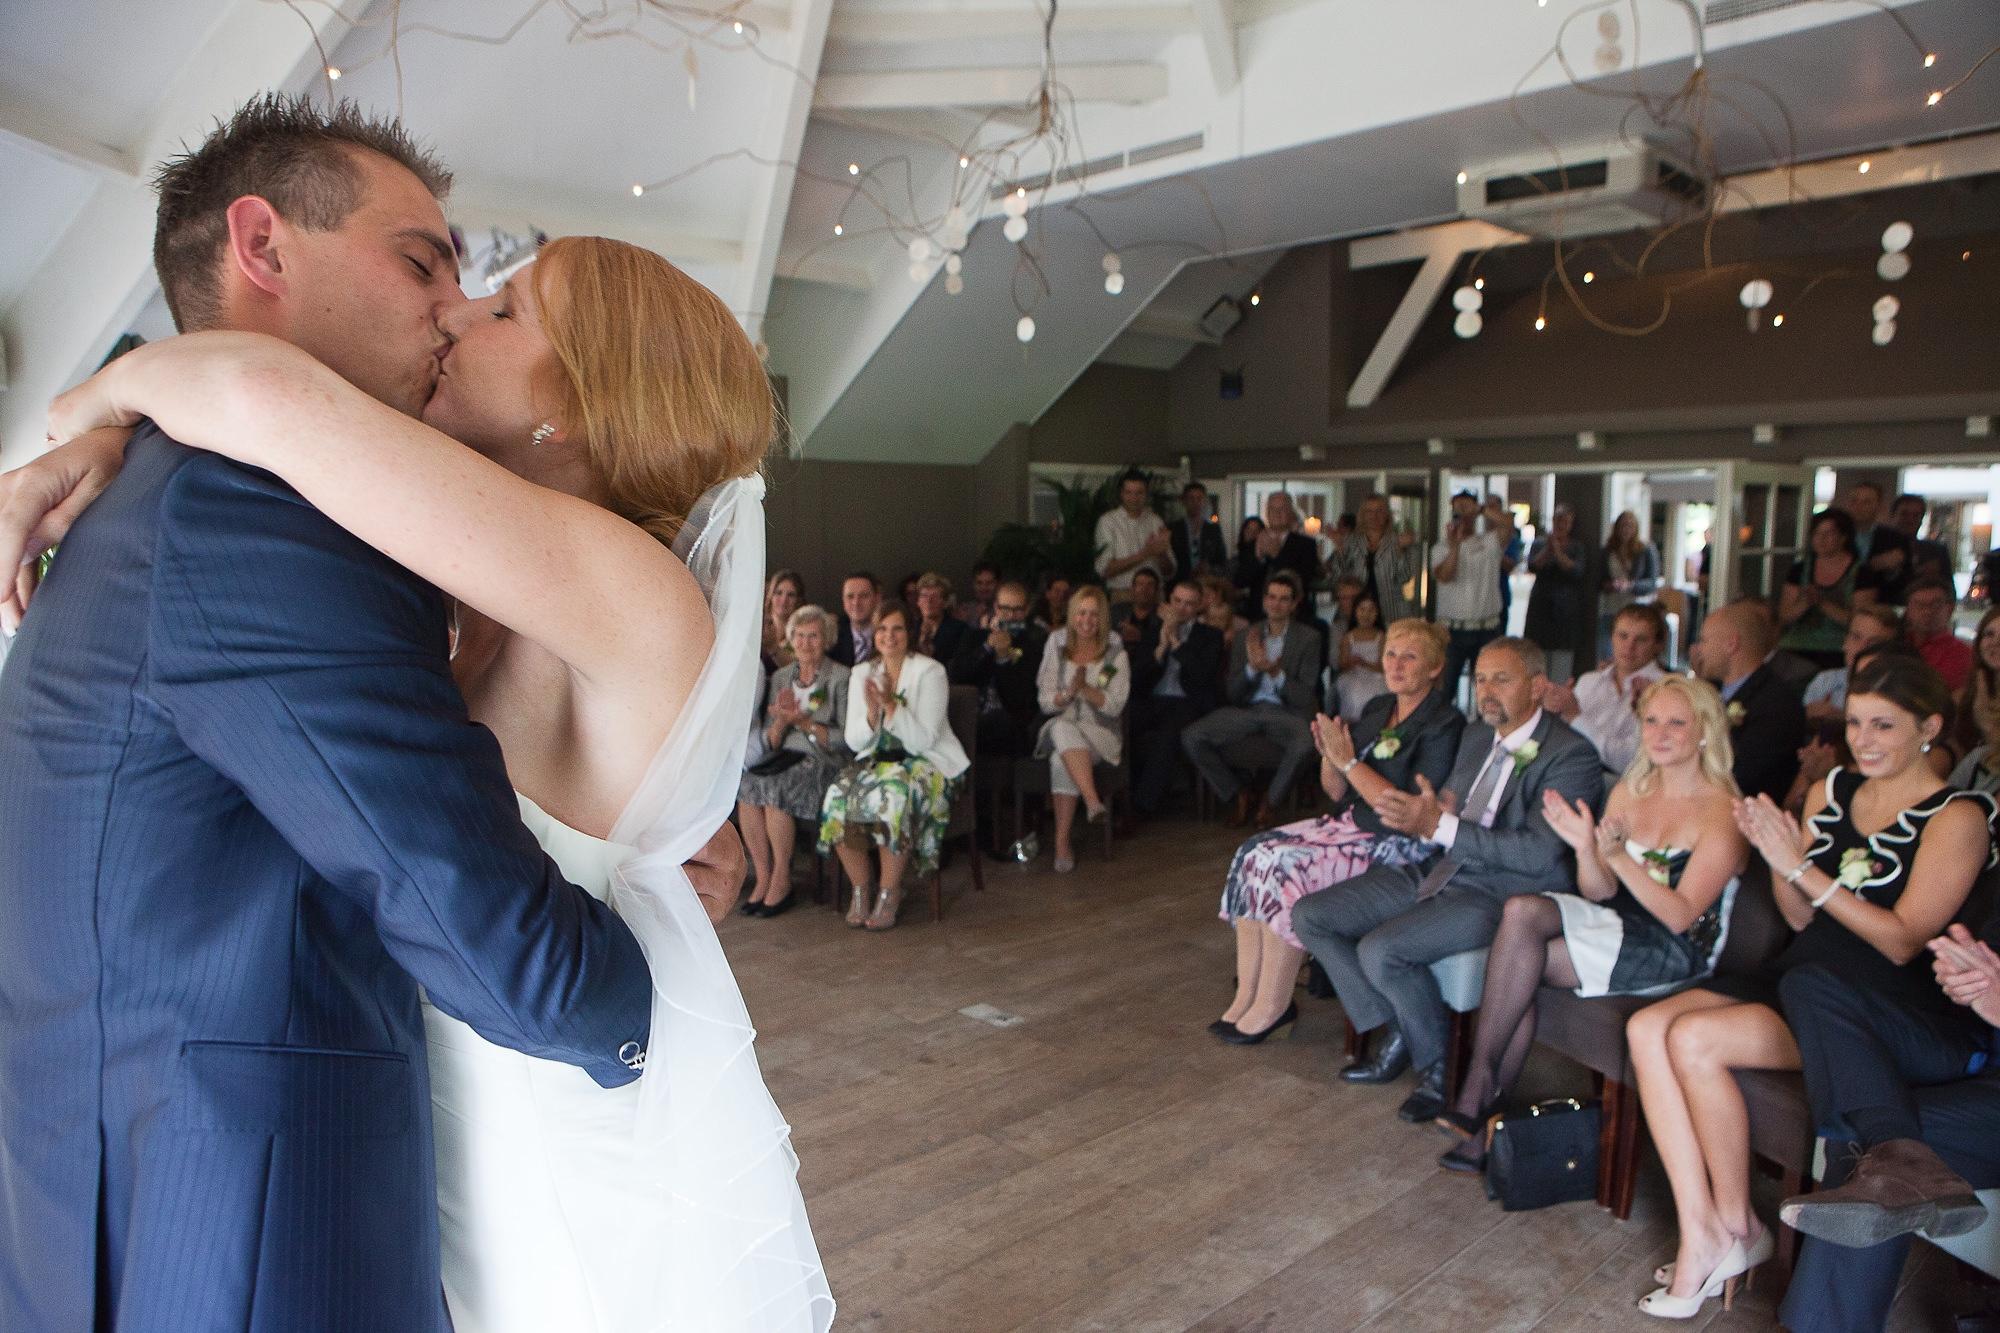 trouwshoot-bruidsfotografie-trouwfoto-feestfotografie-trouwreportage-Jorike en Sebastiaan612.jpg